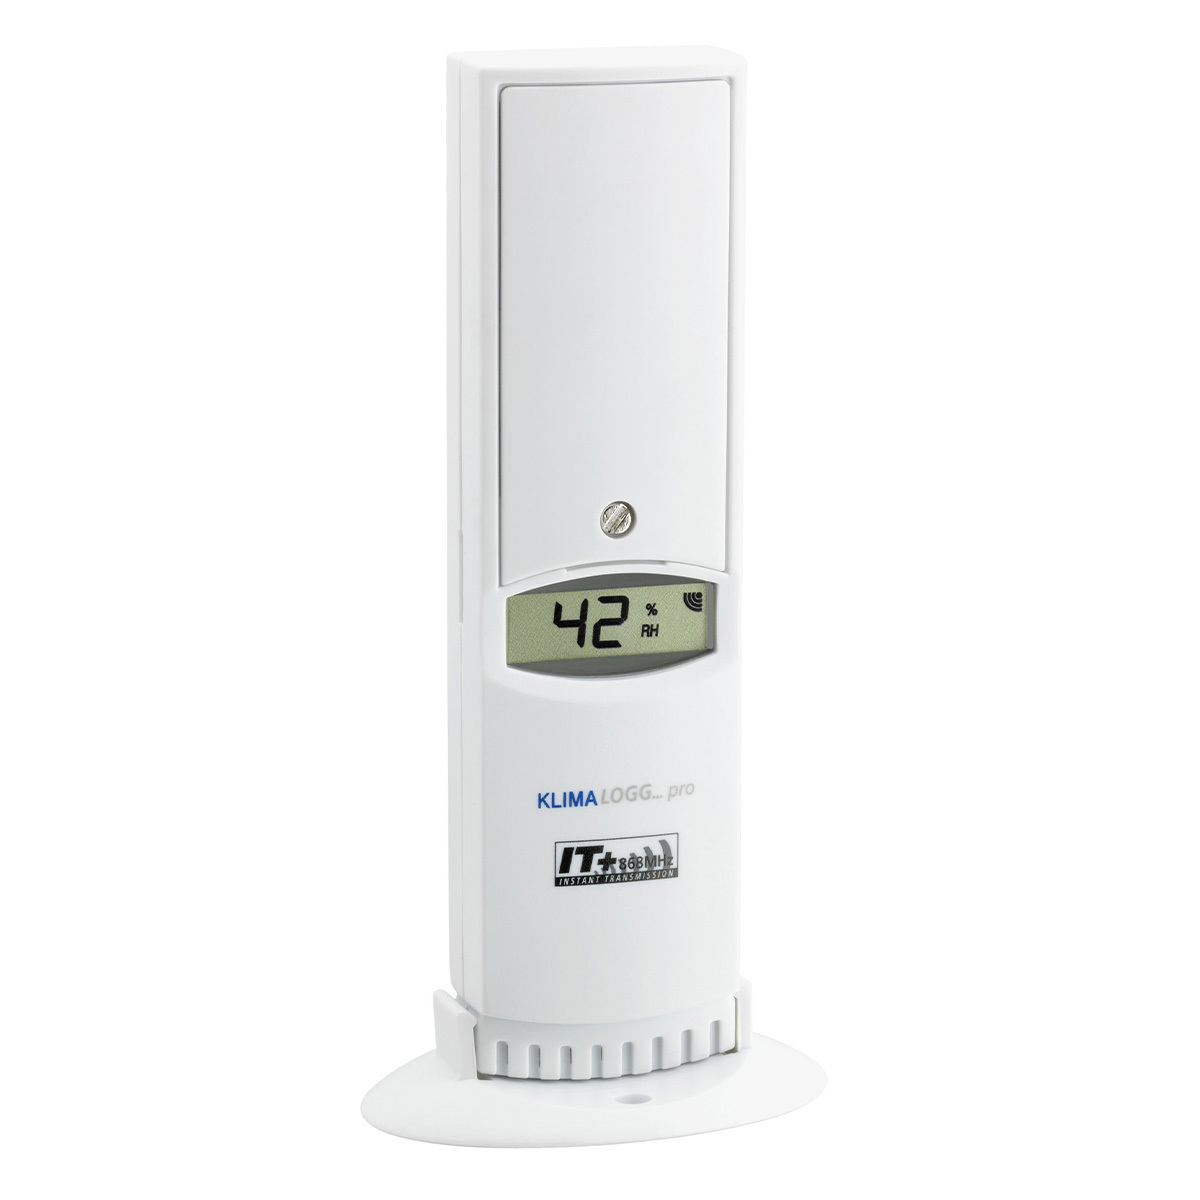 31-4007-02-starter-set-mit-klima@home-funk-thermo-hygrometer-weatherhub-sender-1200x1200px.jpg